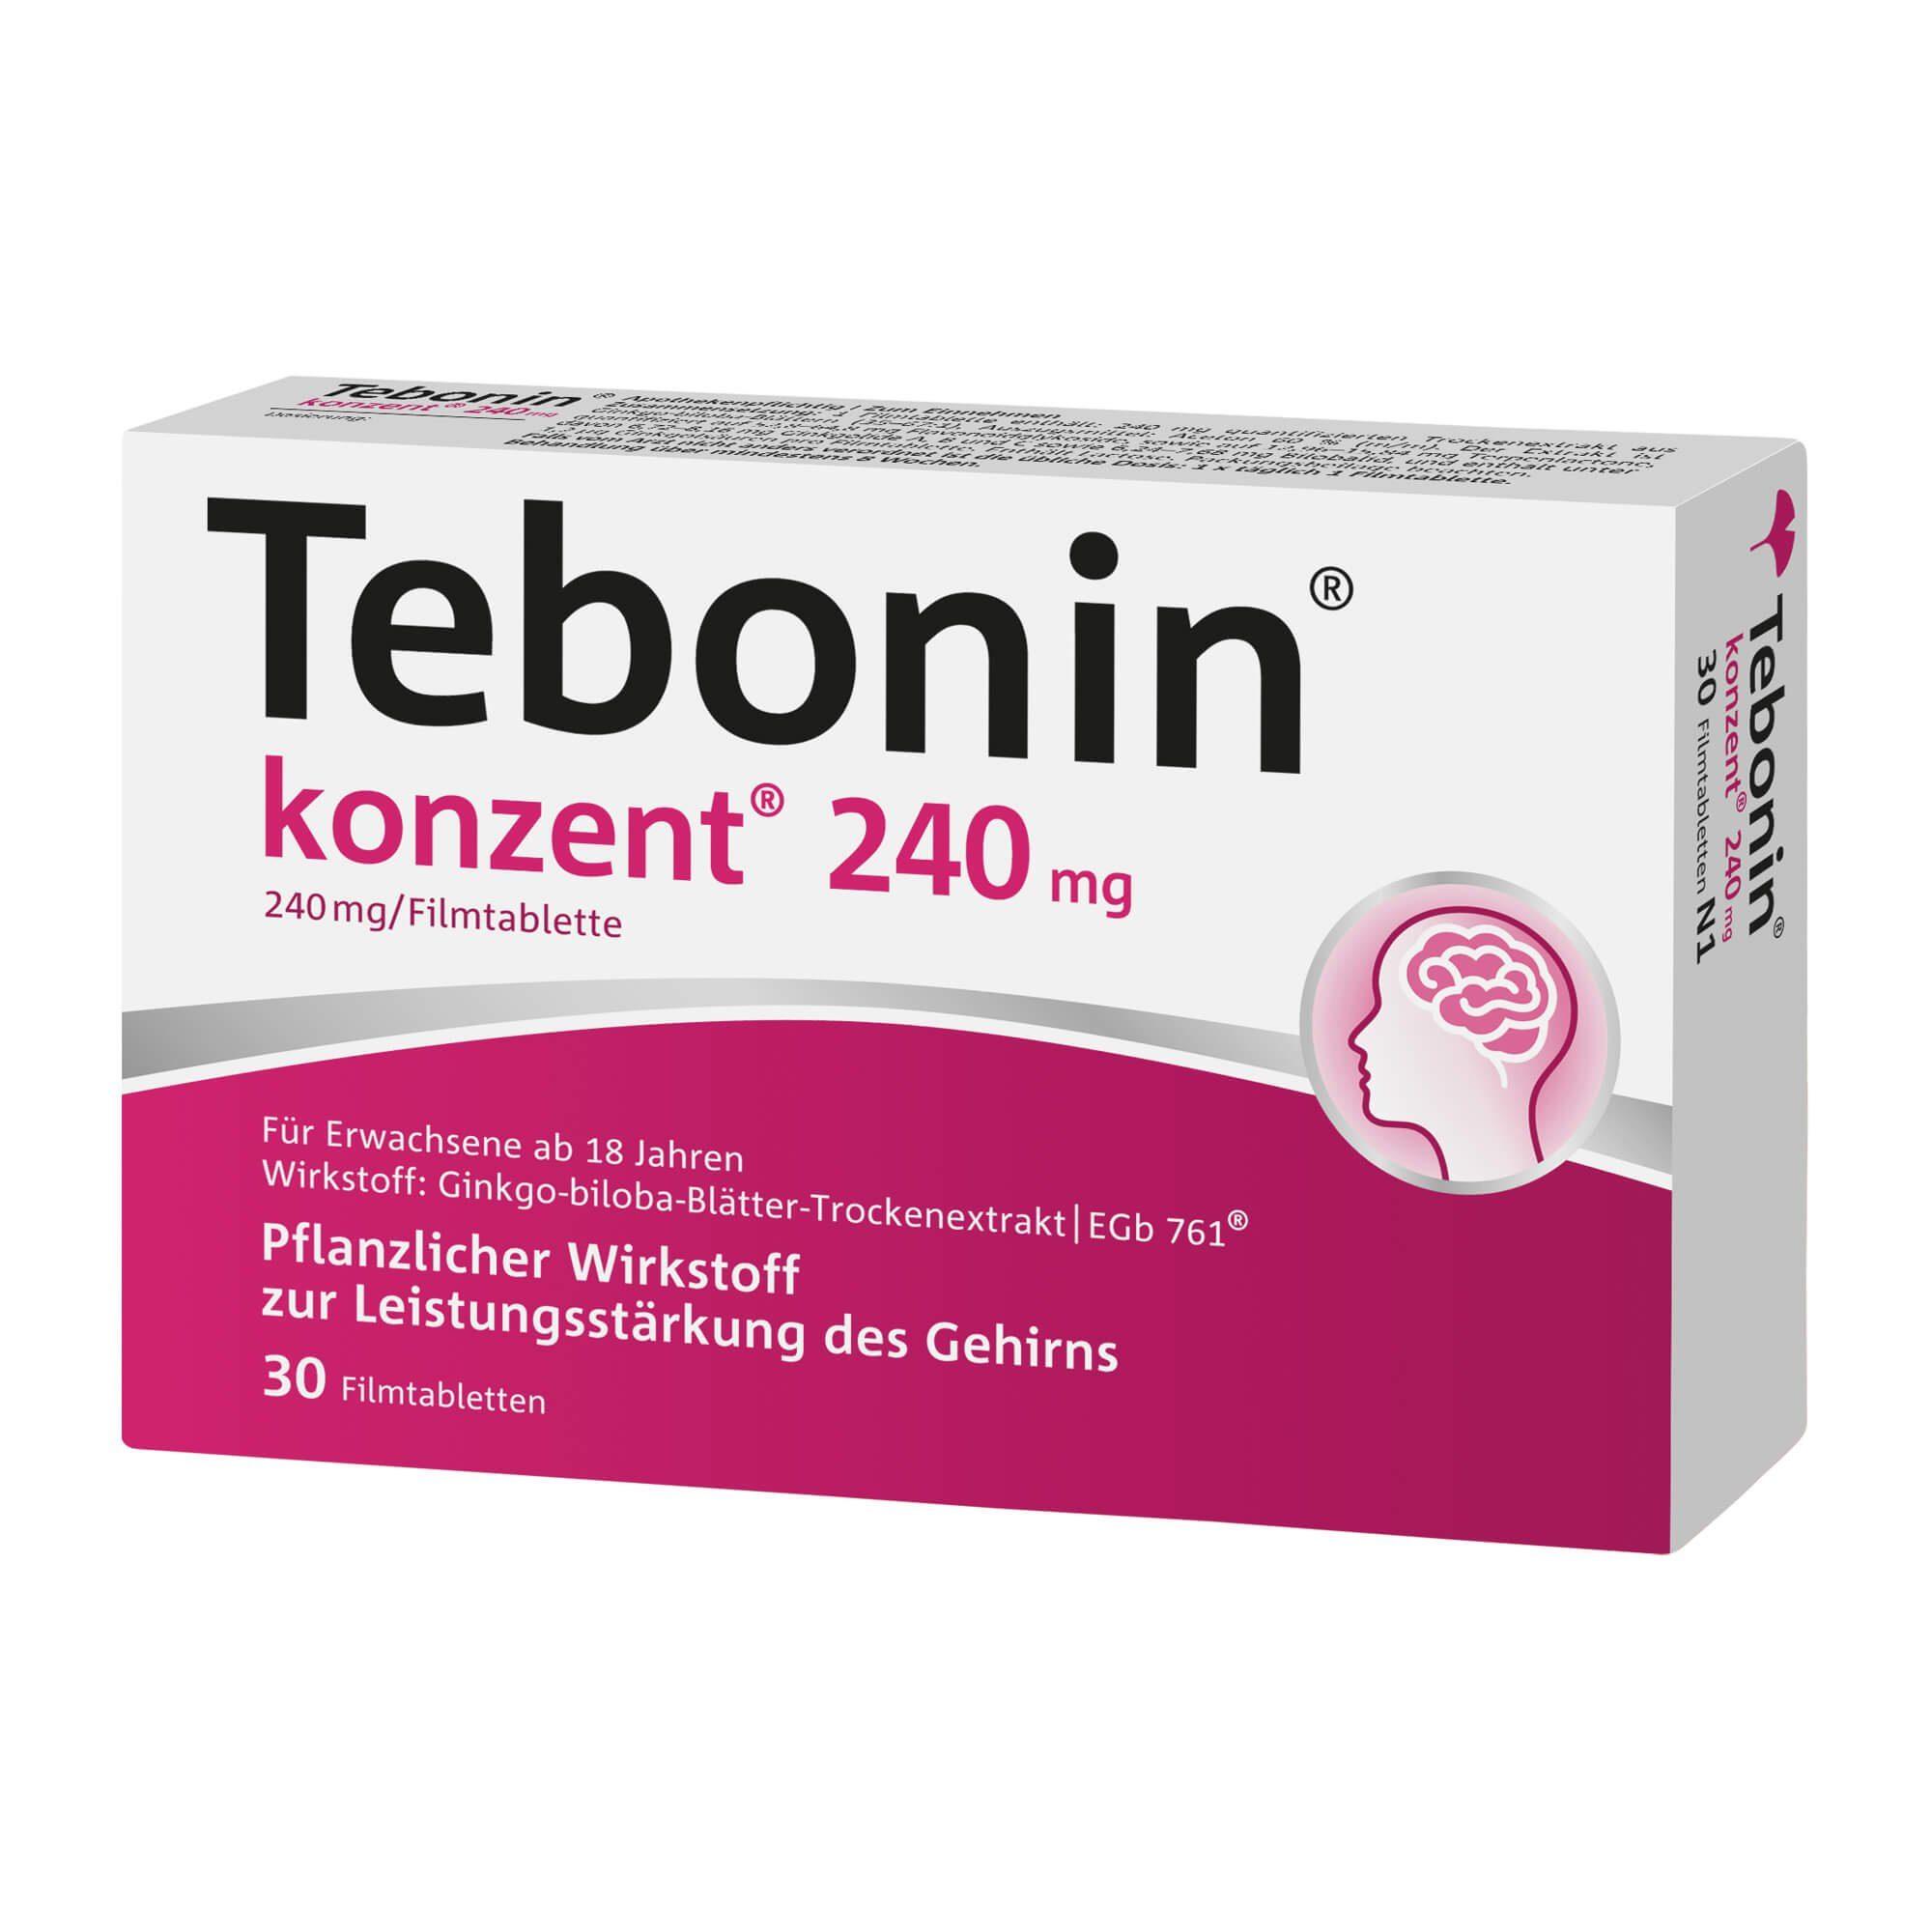 Tebonin konzent 240 mg, 30 St